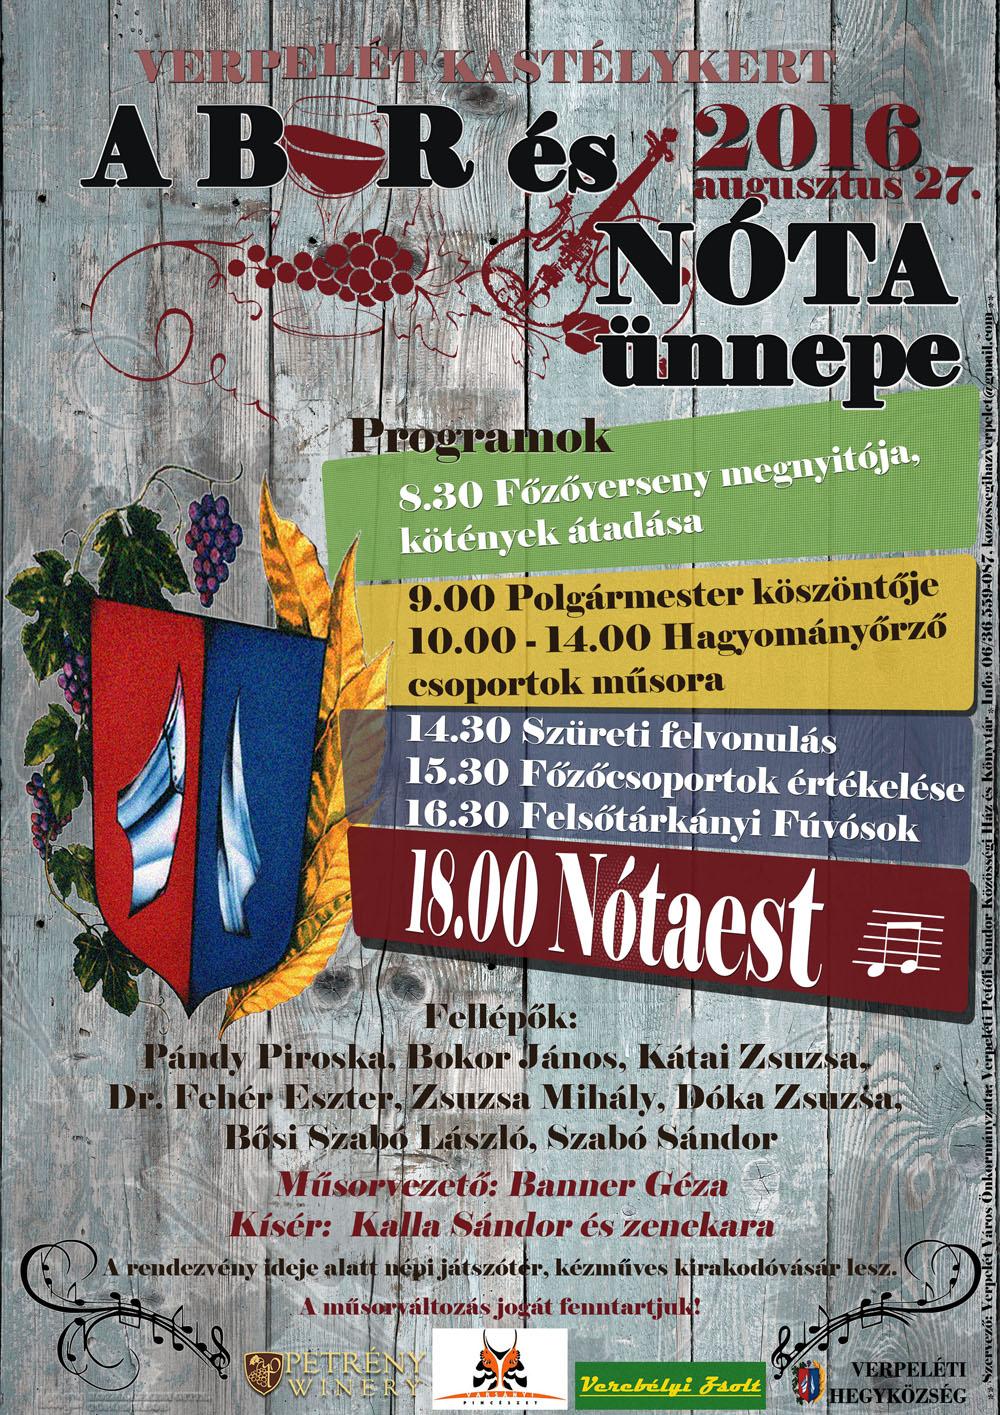 Verpelét A bor és a nóta faluja 2011